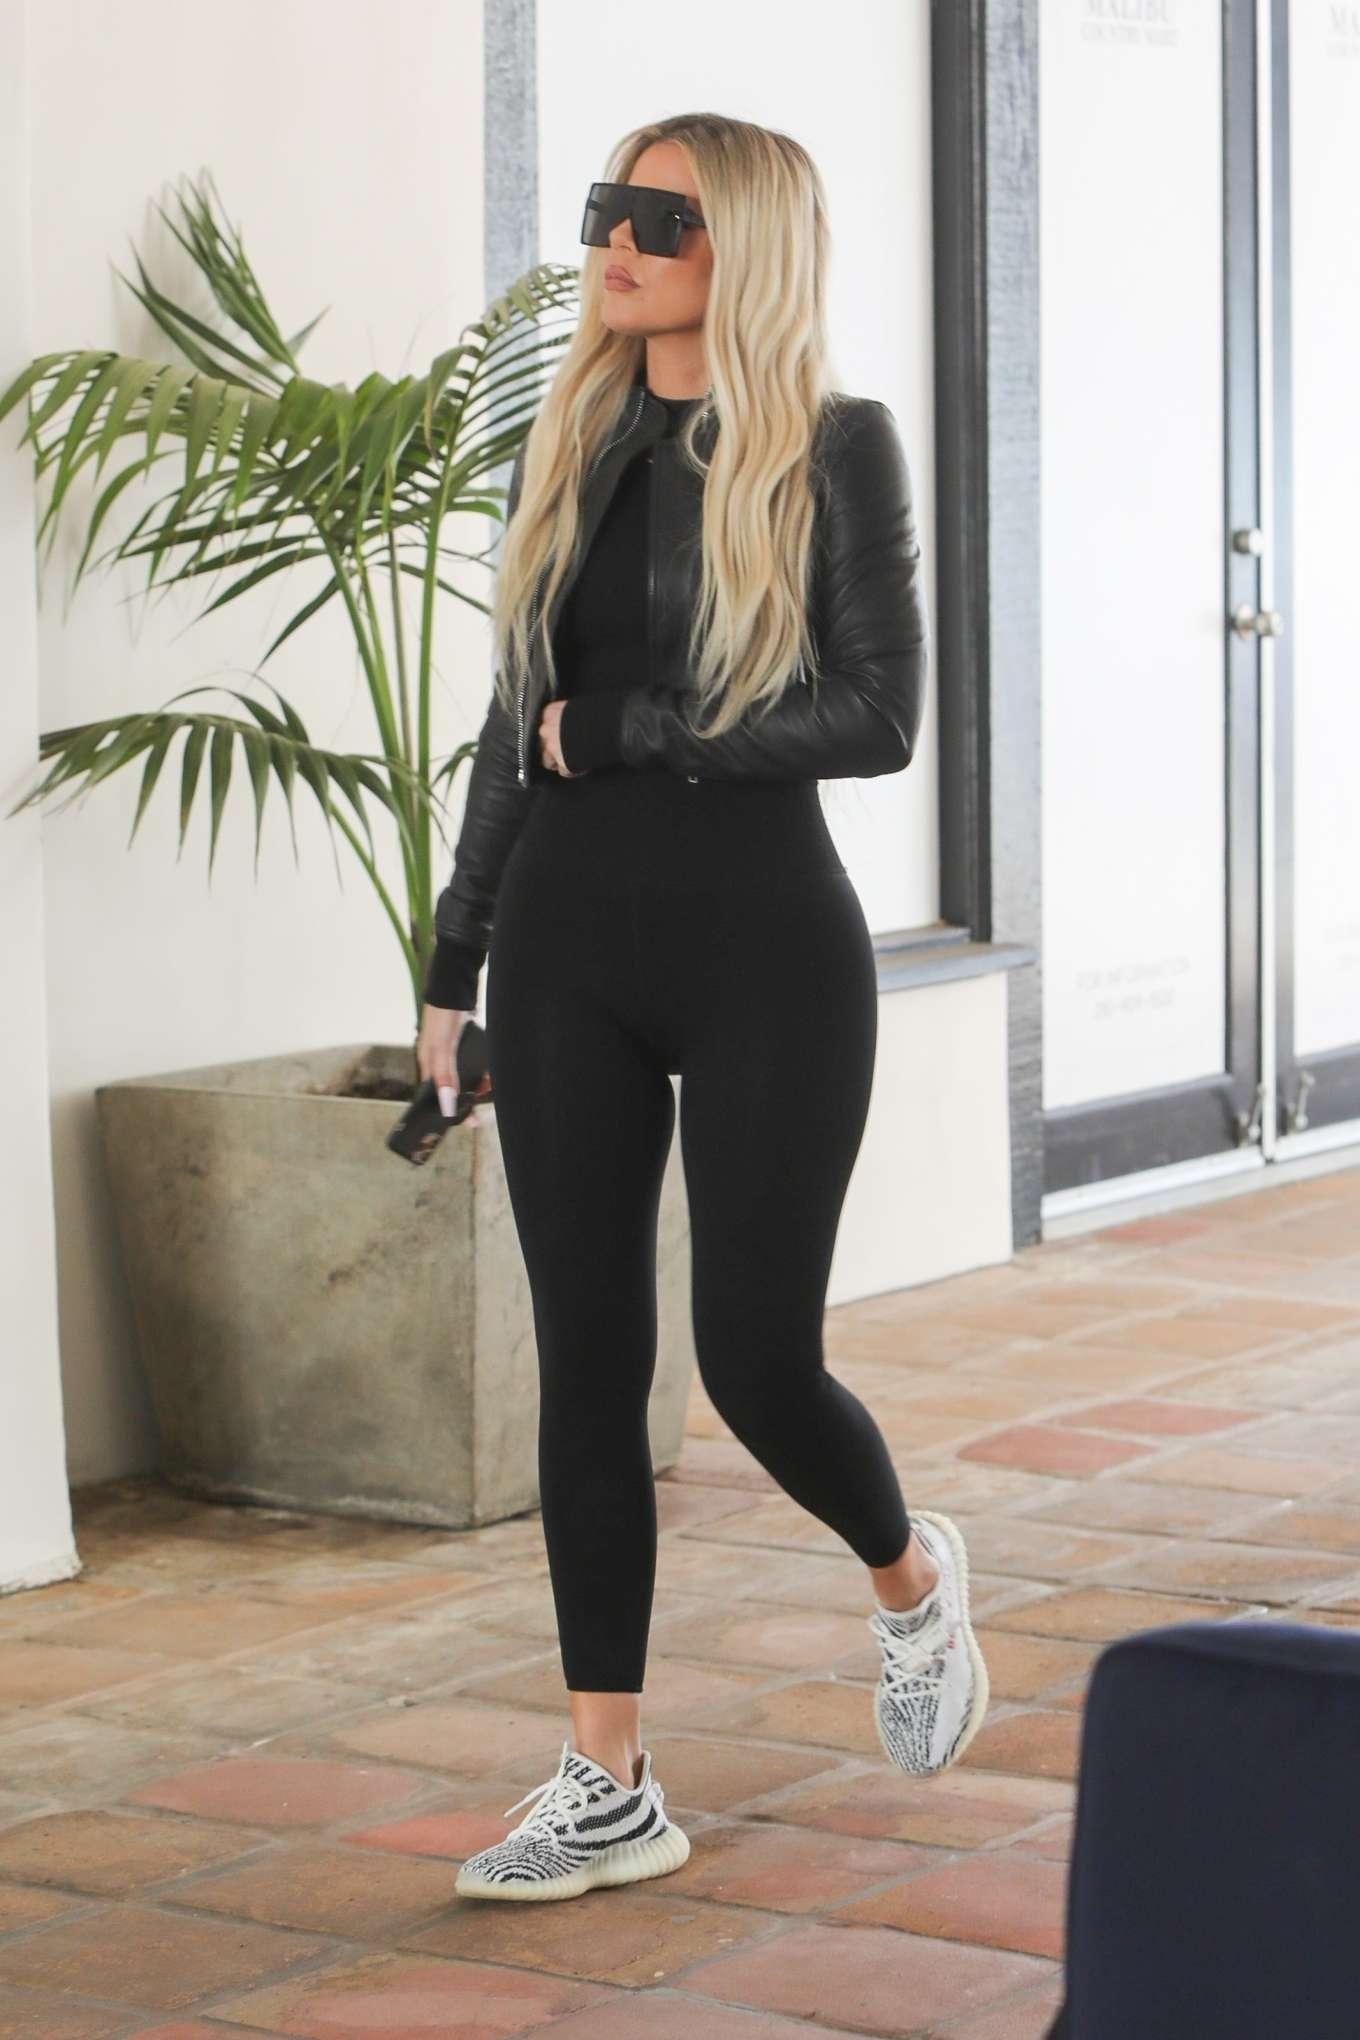 Khloe Kardashian 2019 : Khloe Kardashian – Shopping at Toy Crazy at the Malibu Country Mart-24